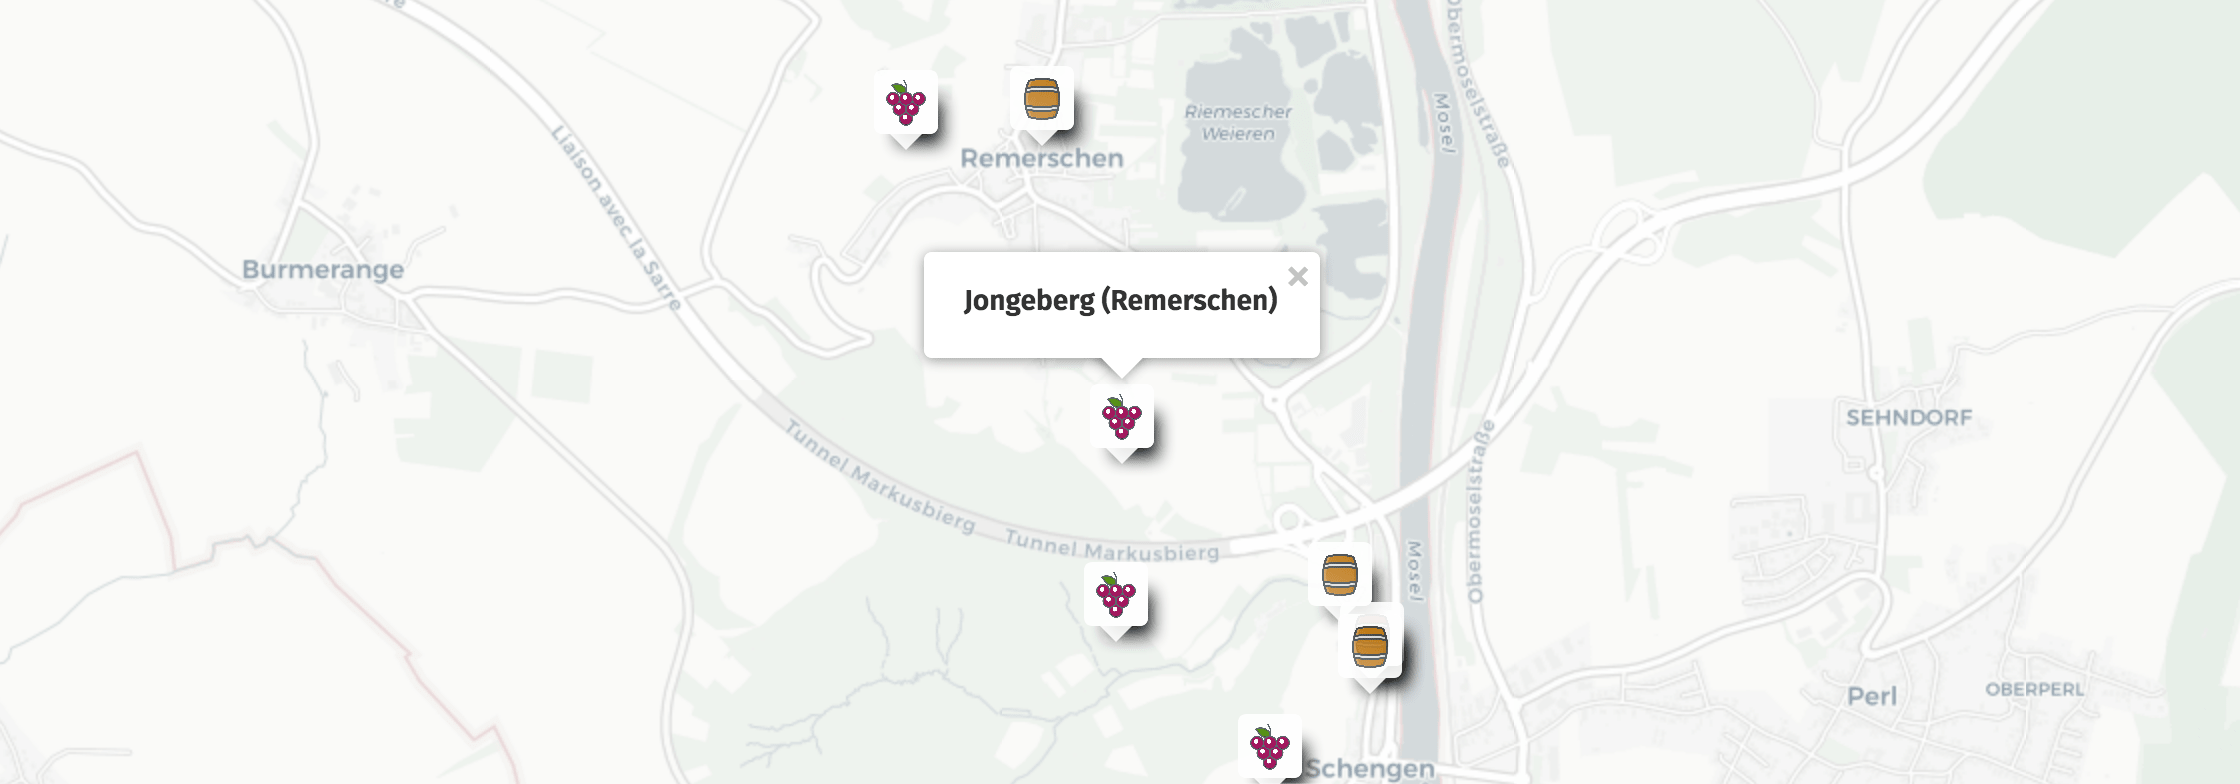 Geolocalisation des vins du Jongeberg à Remerschen